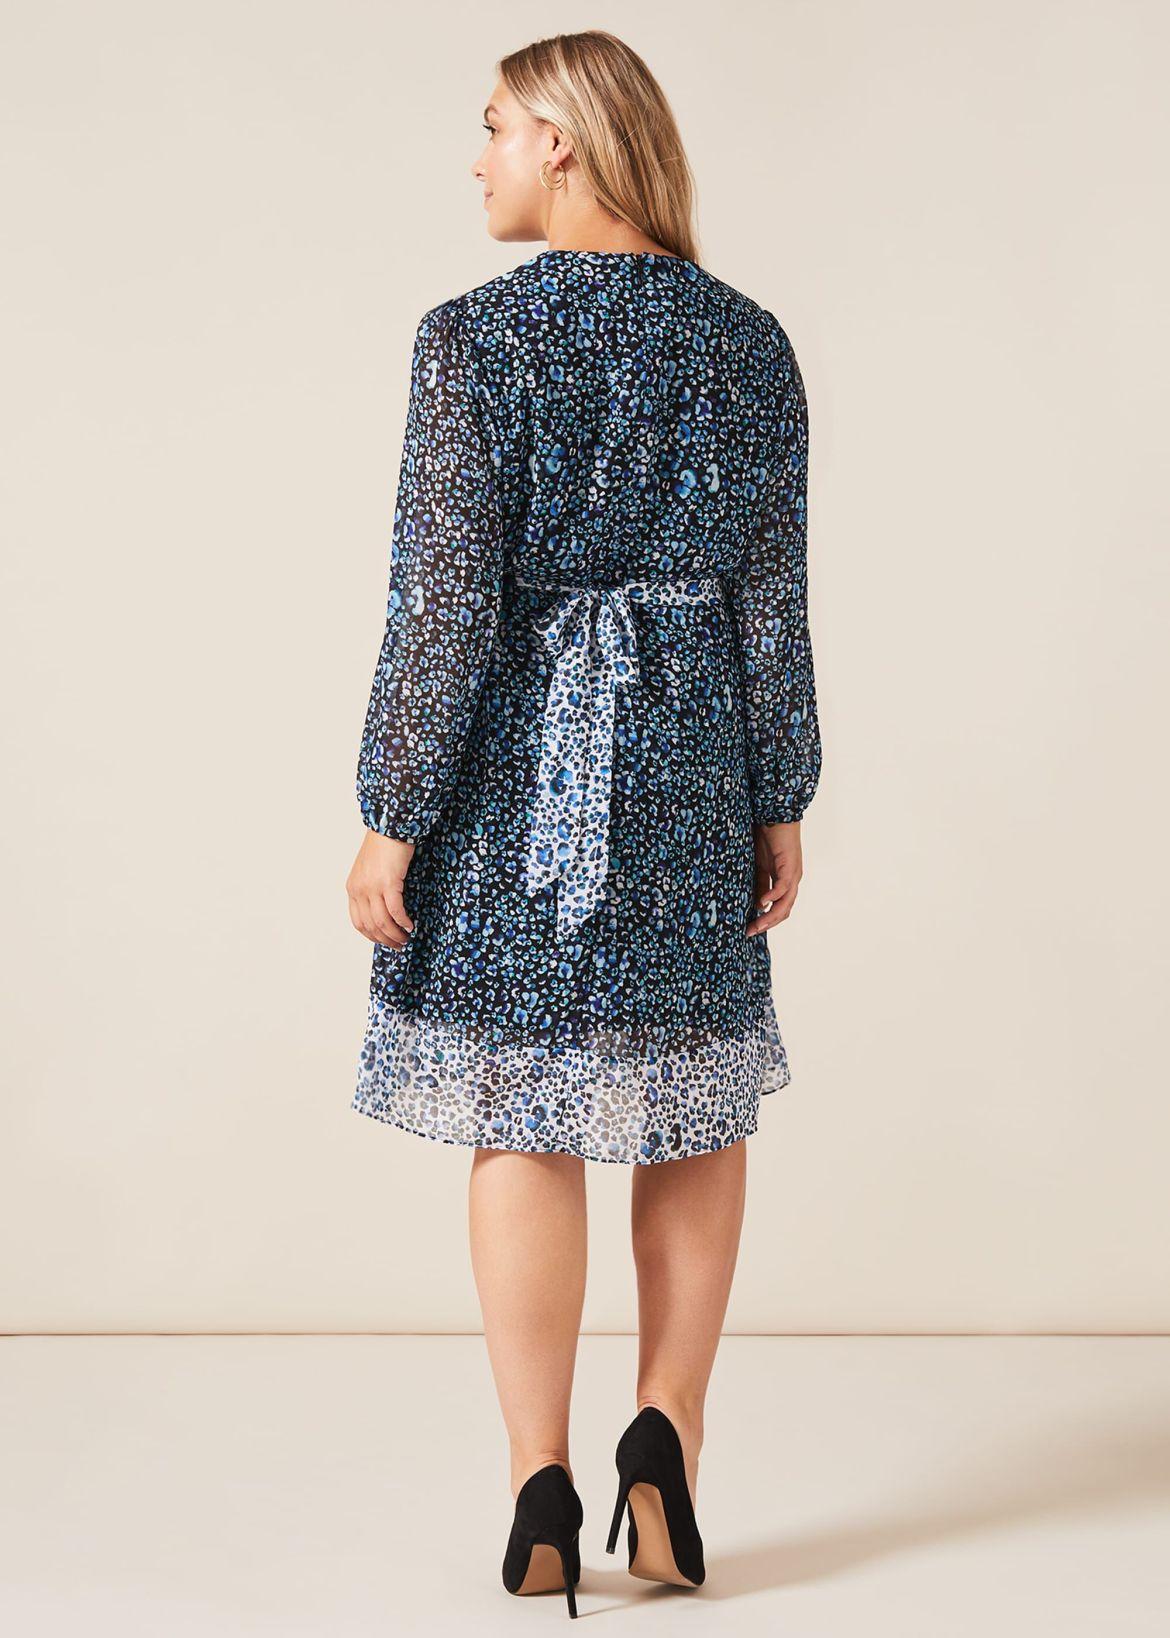 Francessa Printed Dress